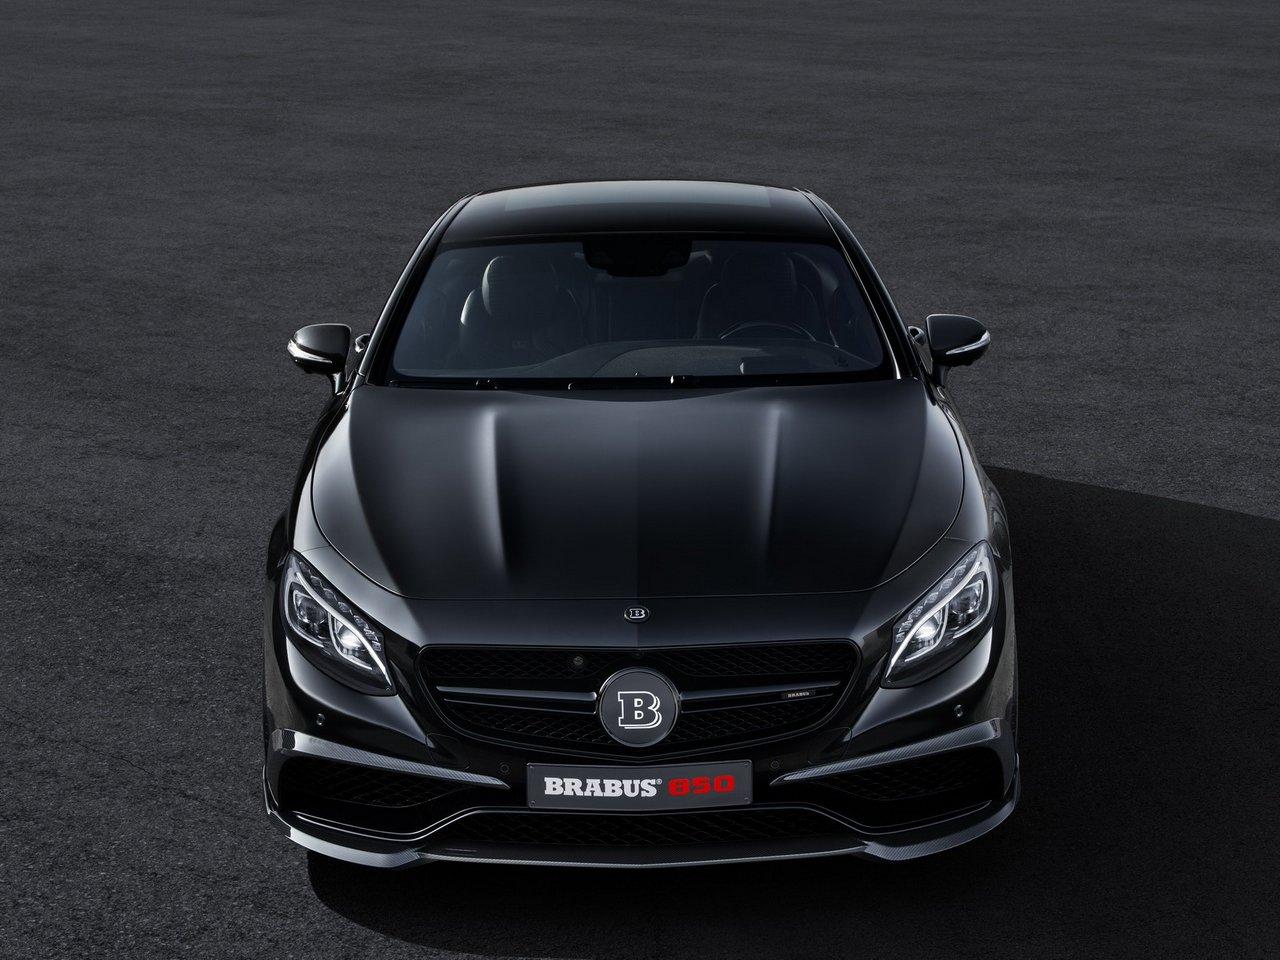 ginevra_2015-brabus-850-sc-e-mercedes-s63-amg-coupe-0-100_11